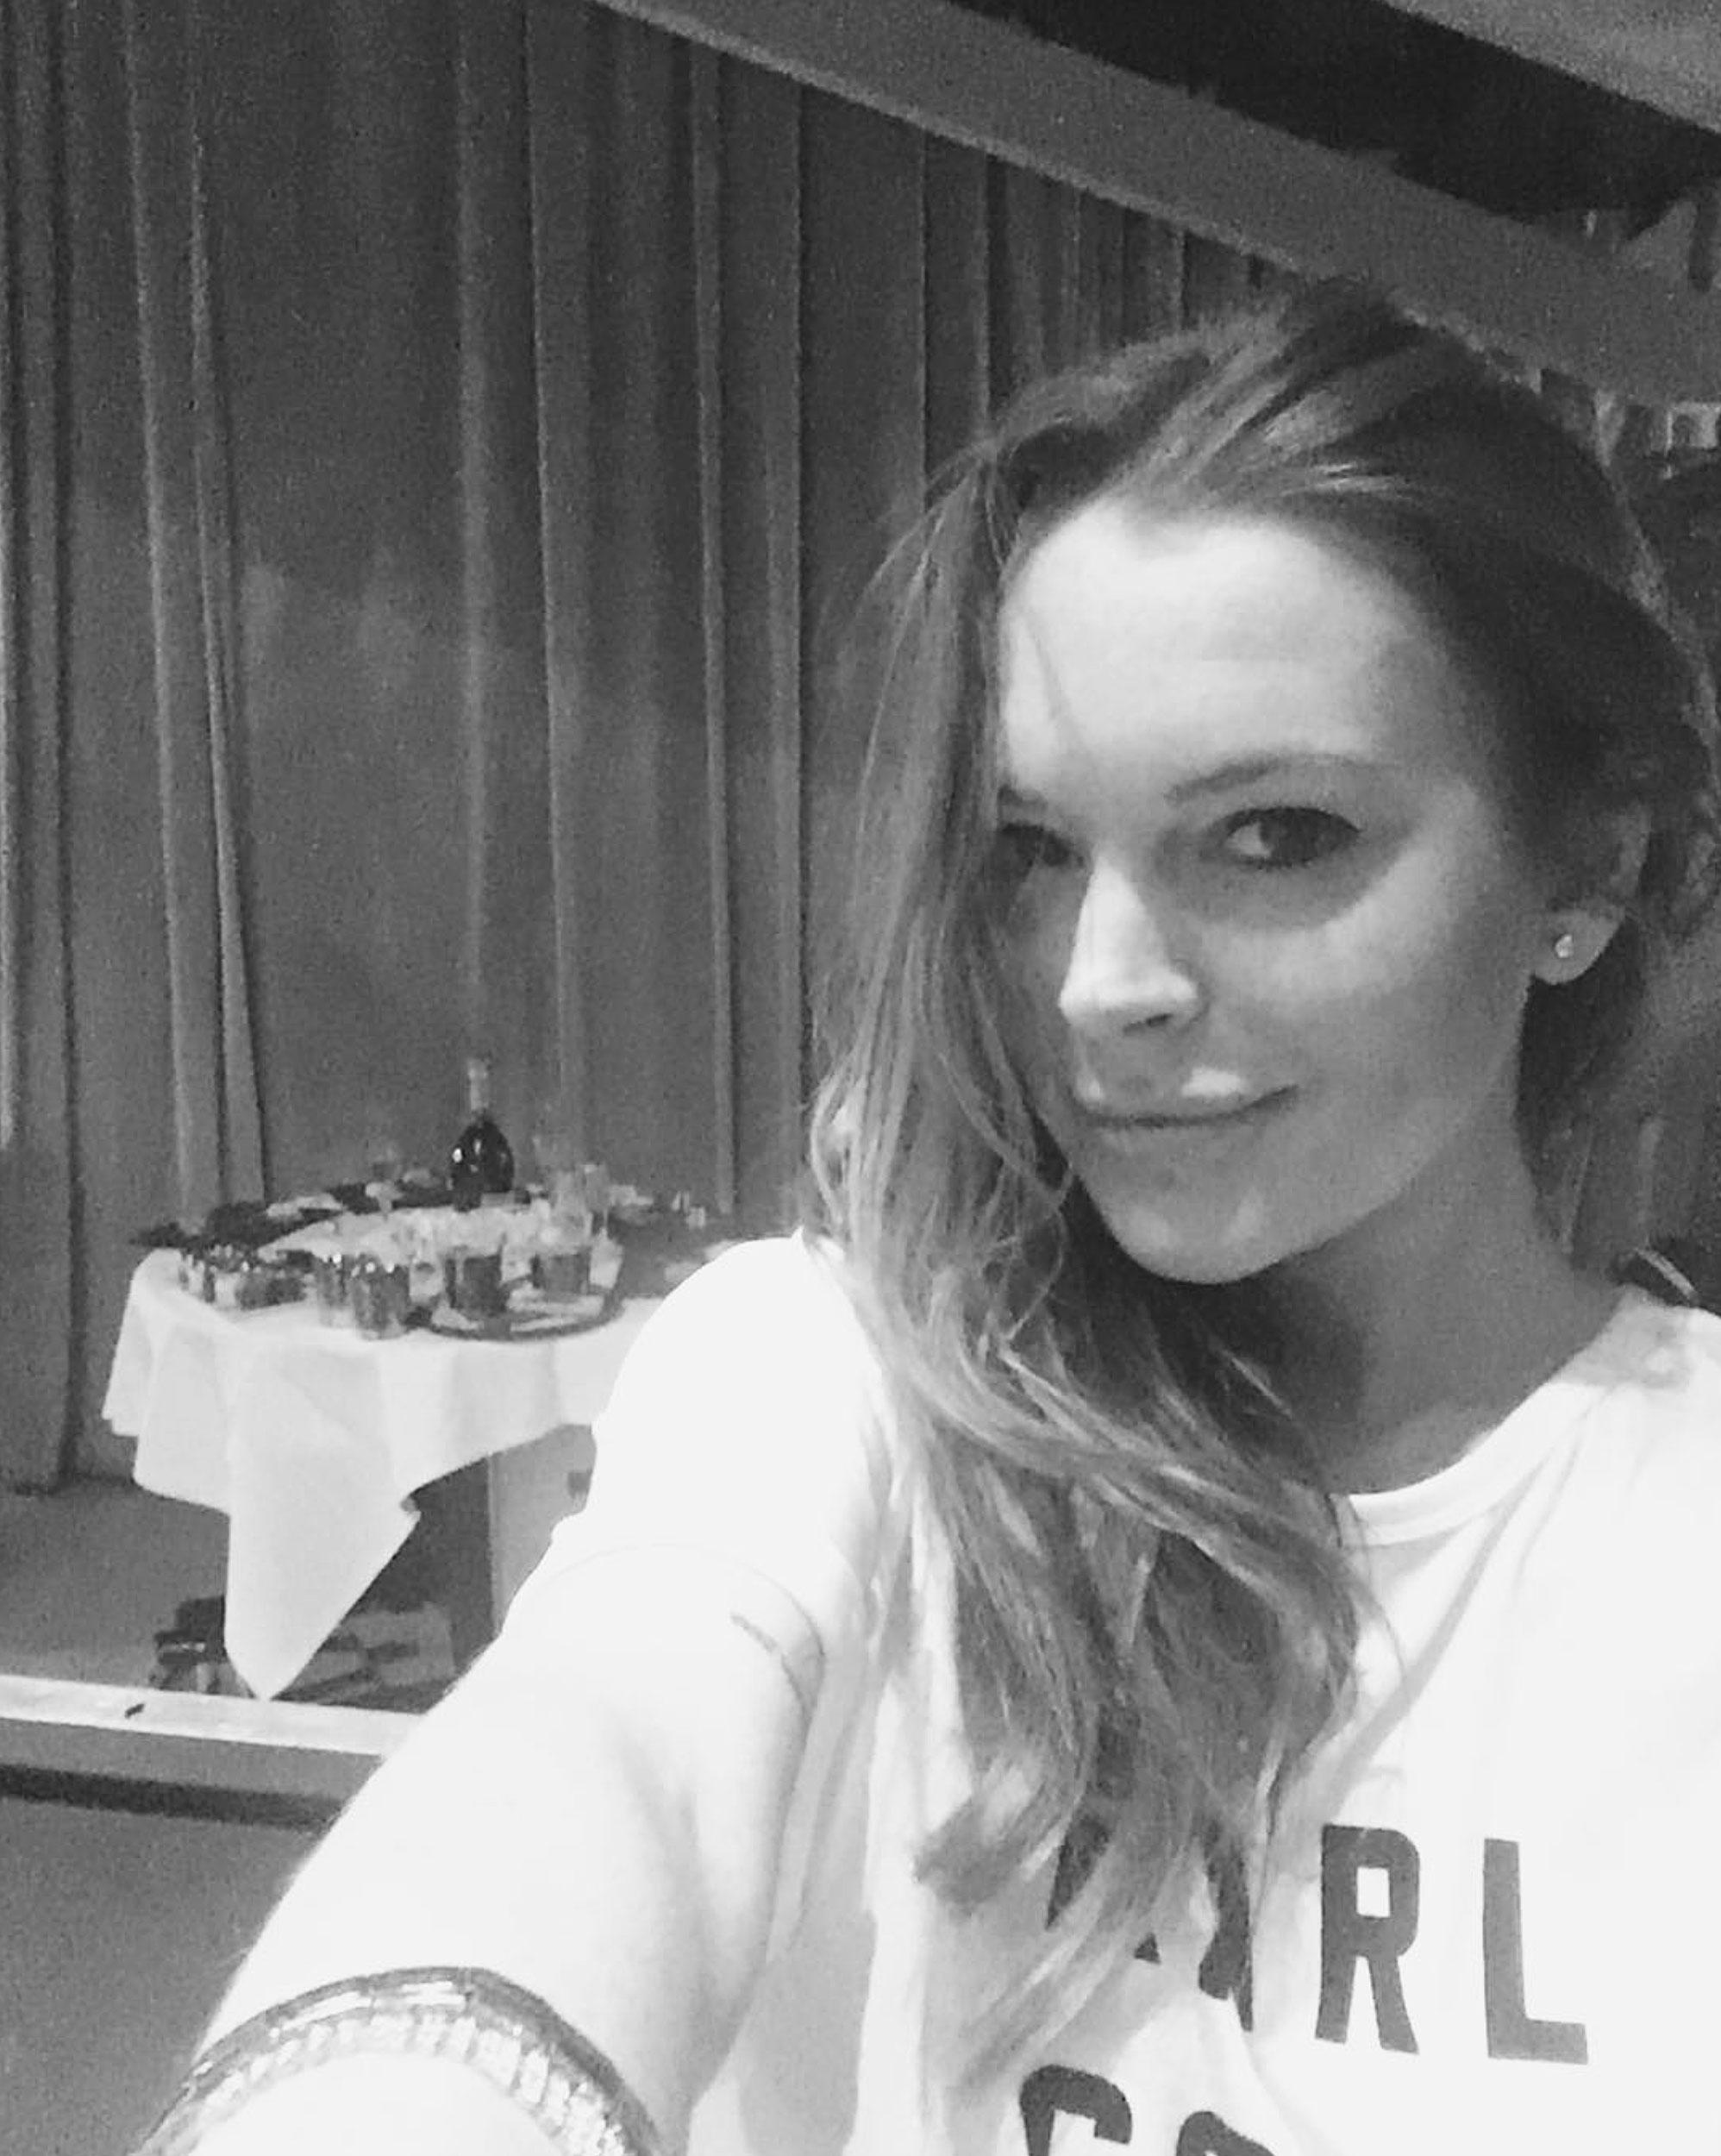 Lindsay Lohan Celebrity Hair Transformation